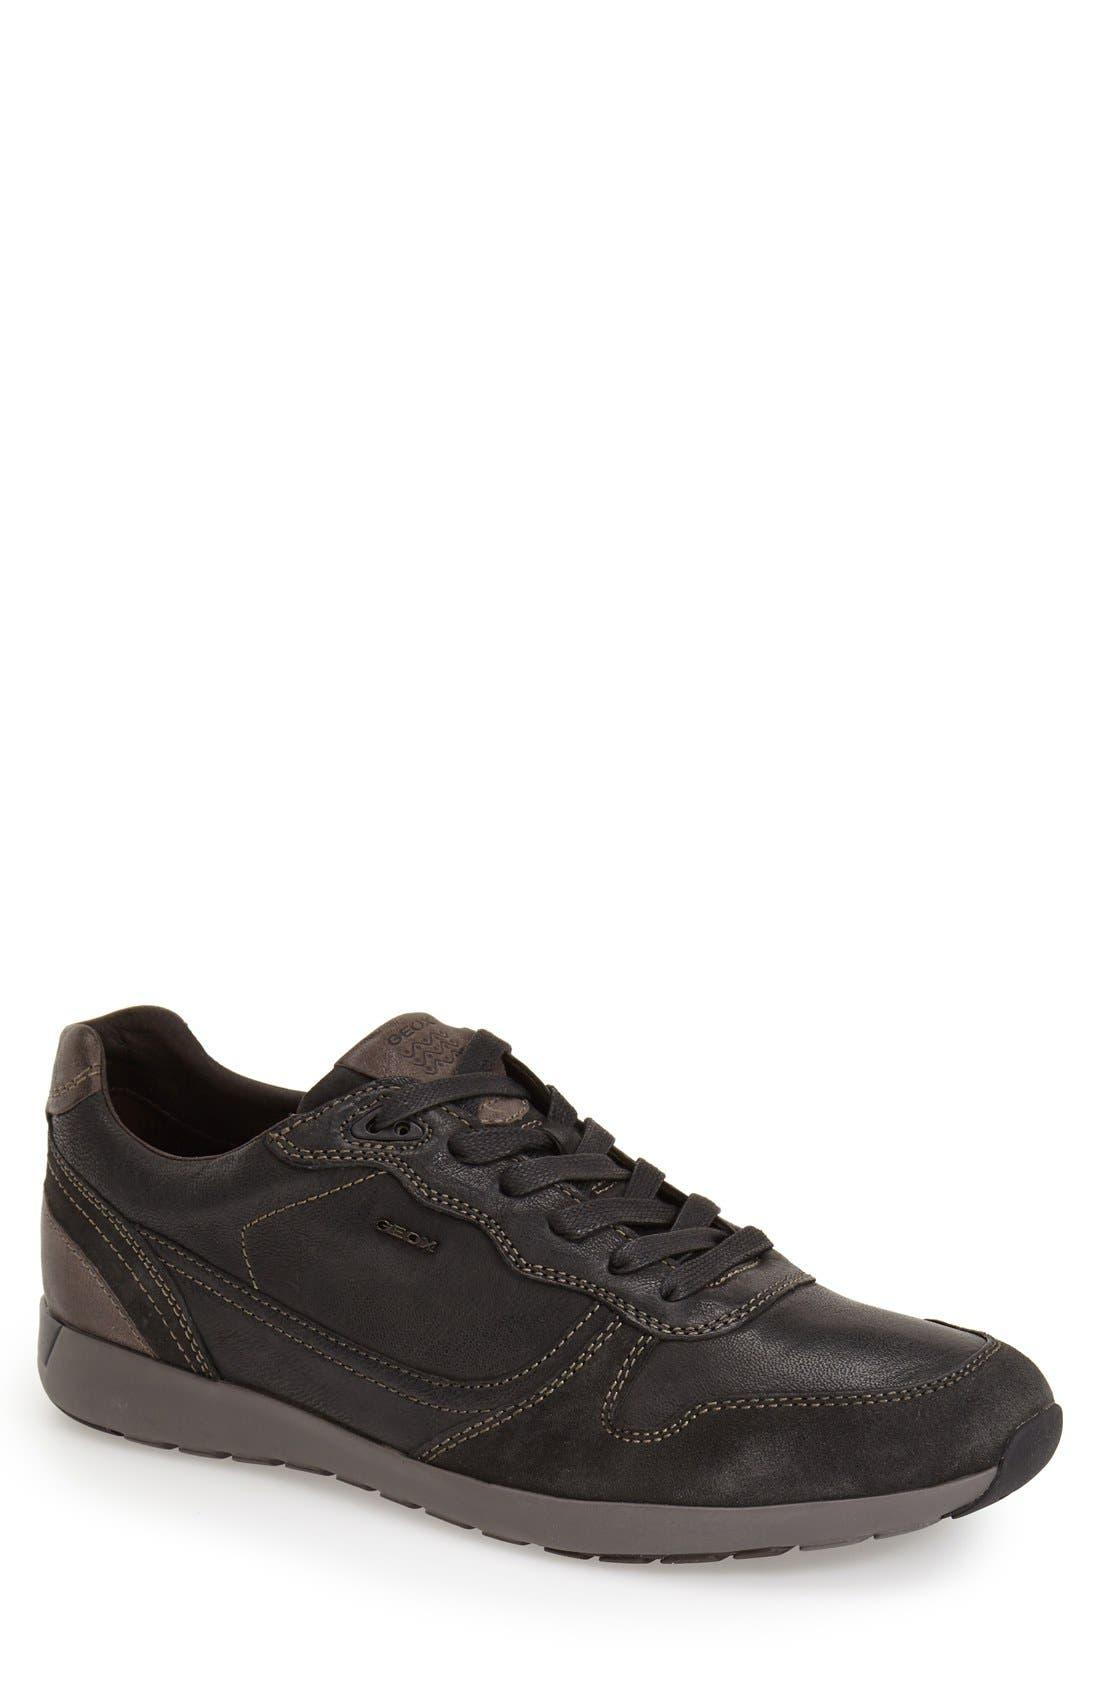 'Jepson' Sneaker,                             Main thumbnail 1, color,                             001